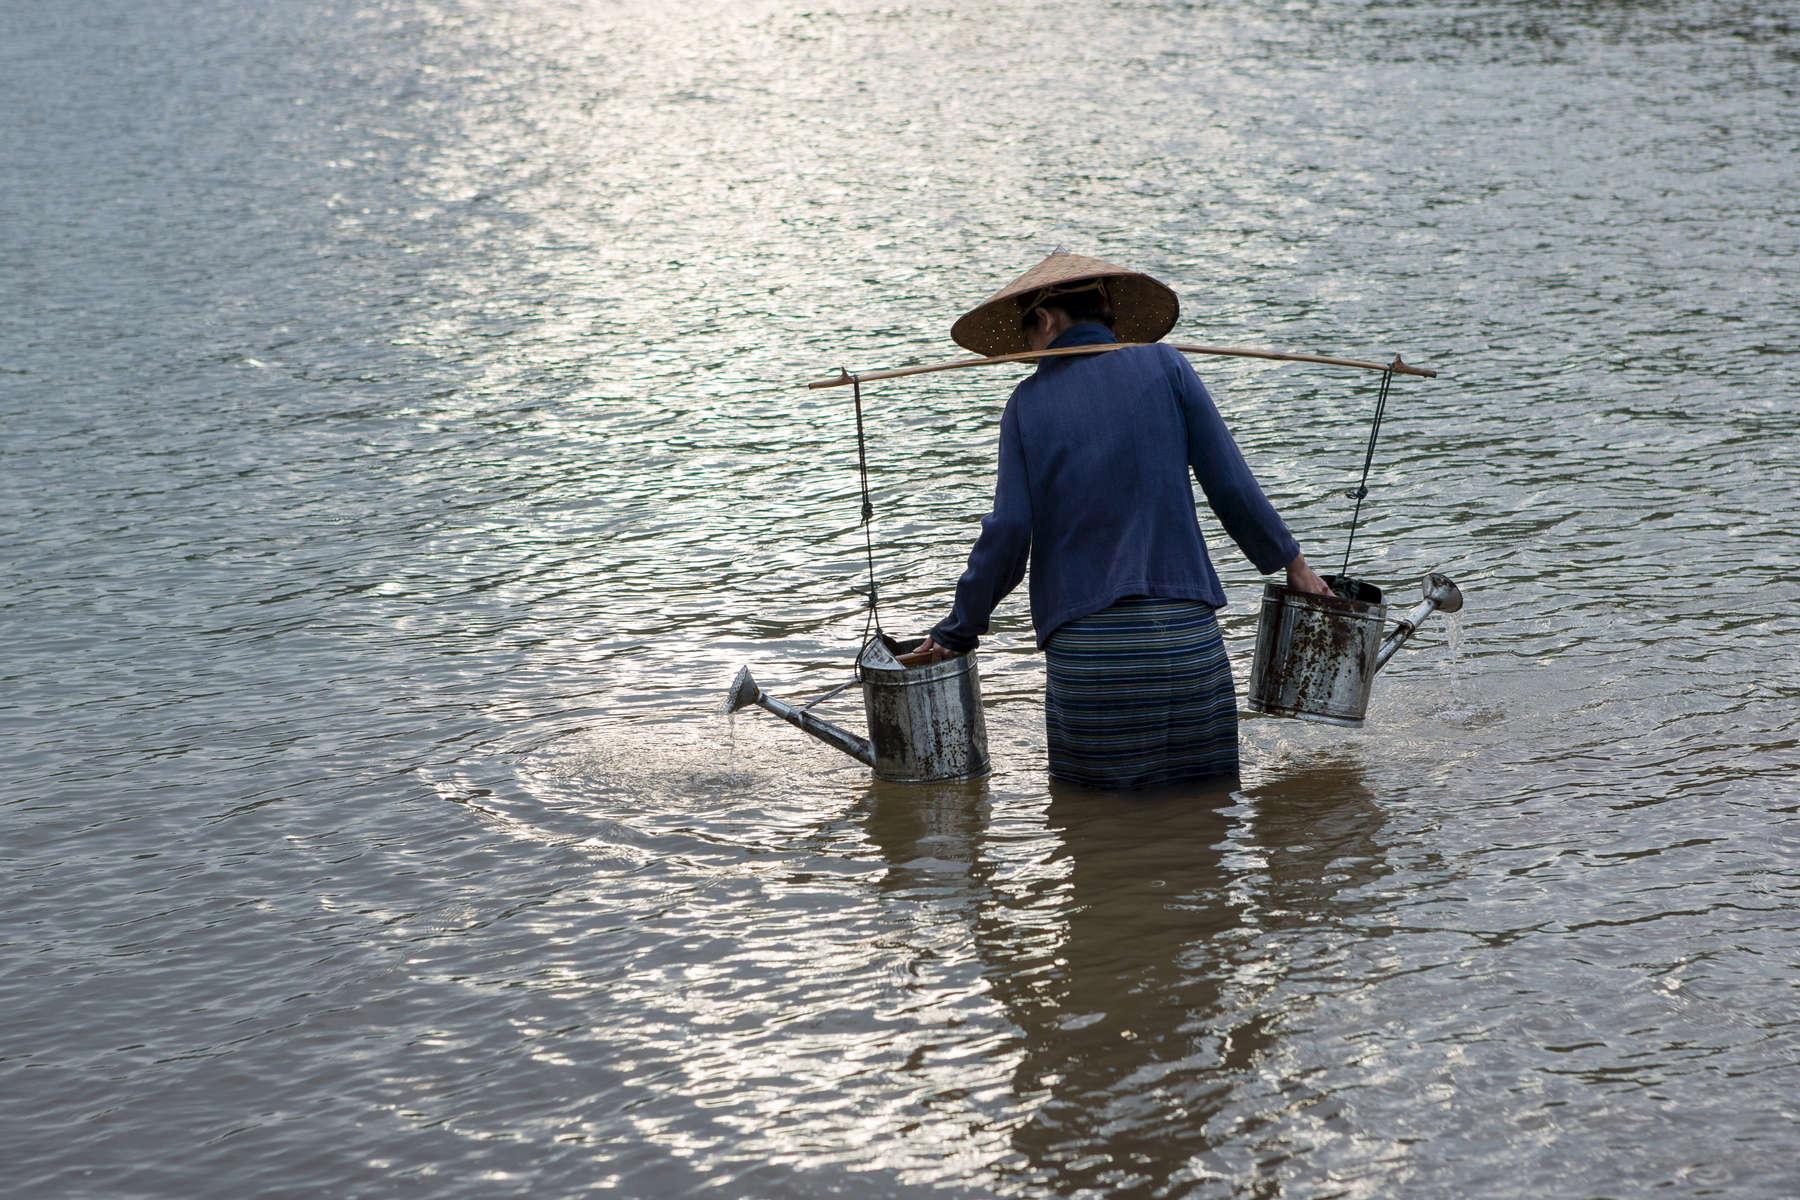 laos-farmer-mekong-photo-by-cyril-eberle-CEB_0332